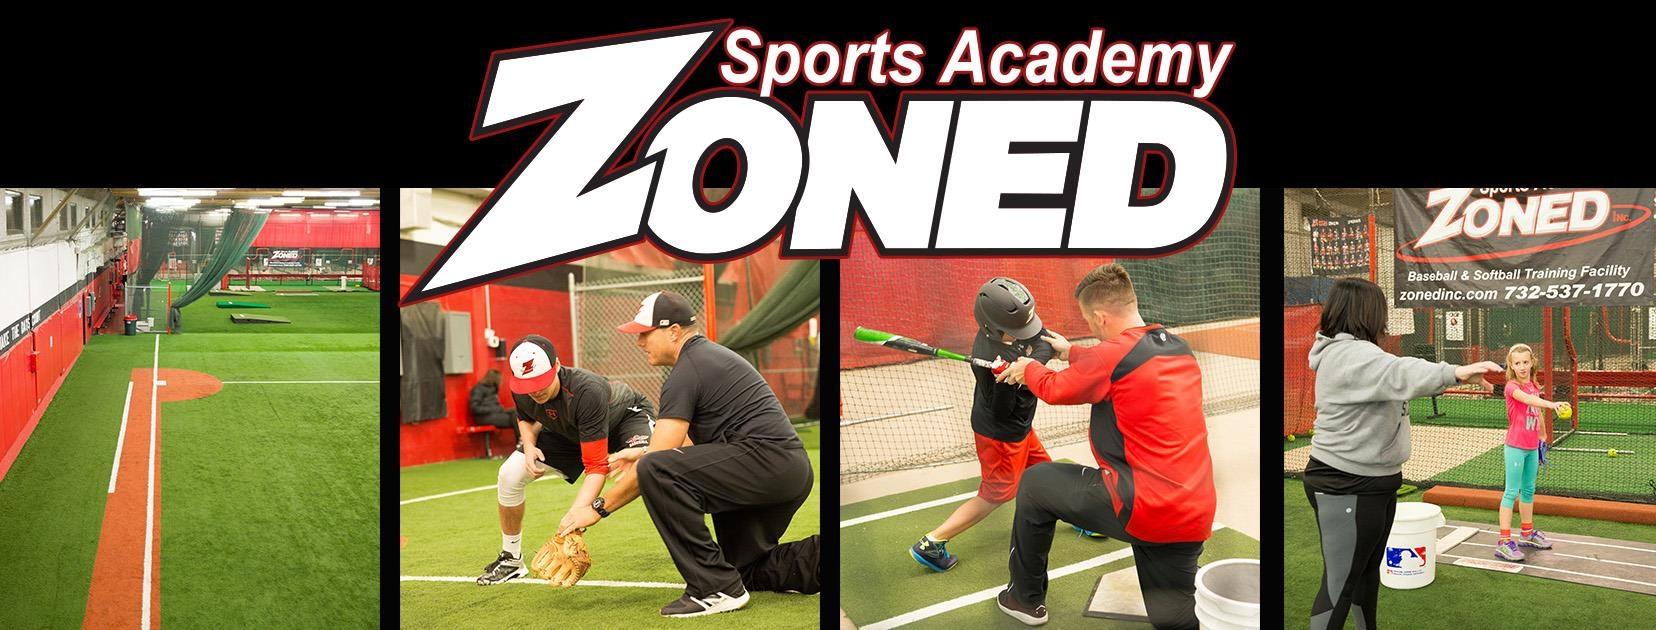 Zoned Sports Academy Inc (@zonedinc) Cover Image